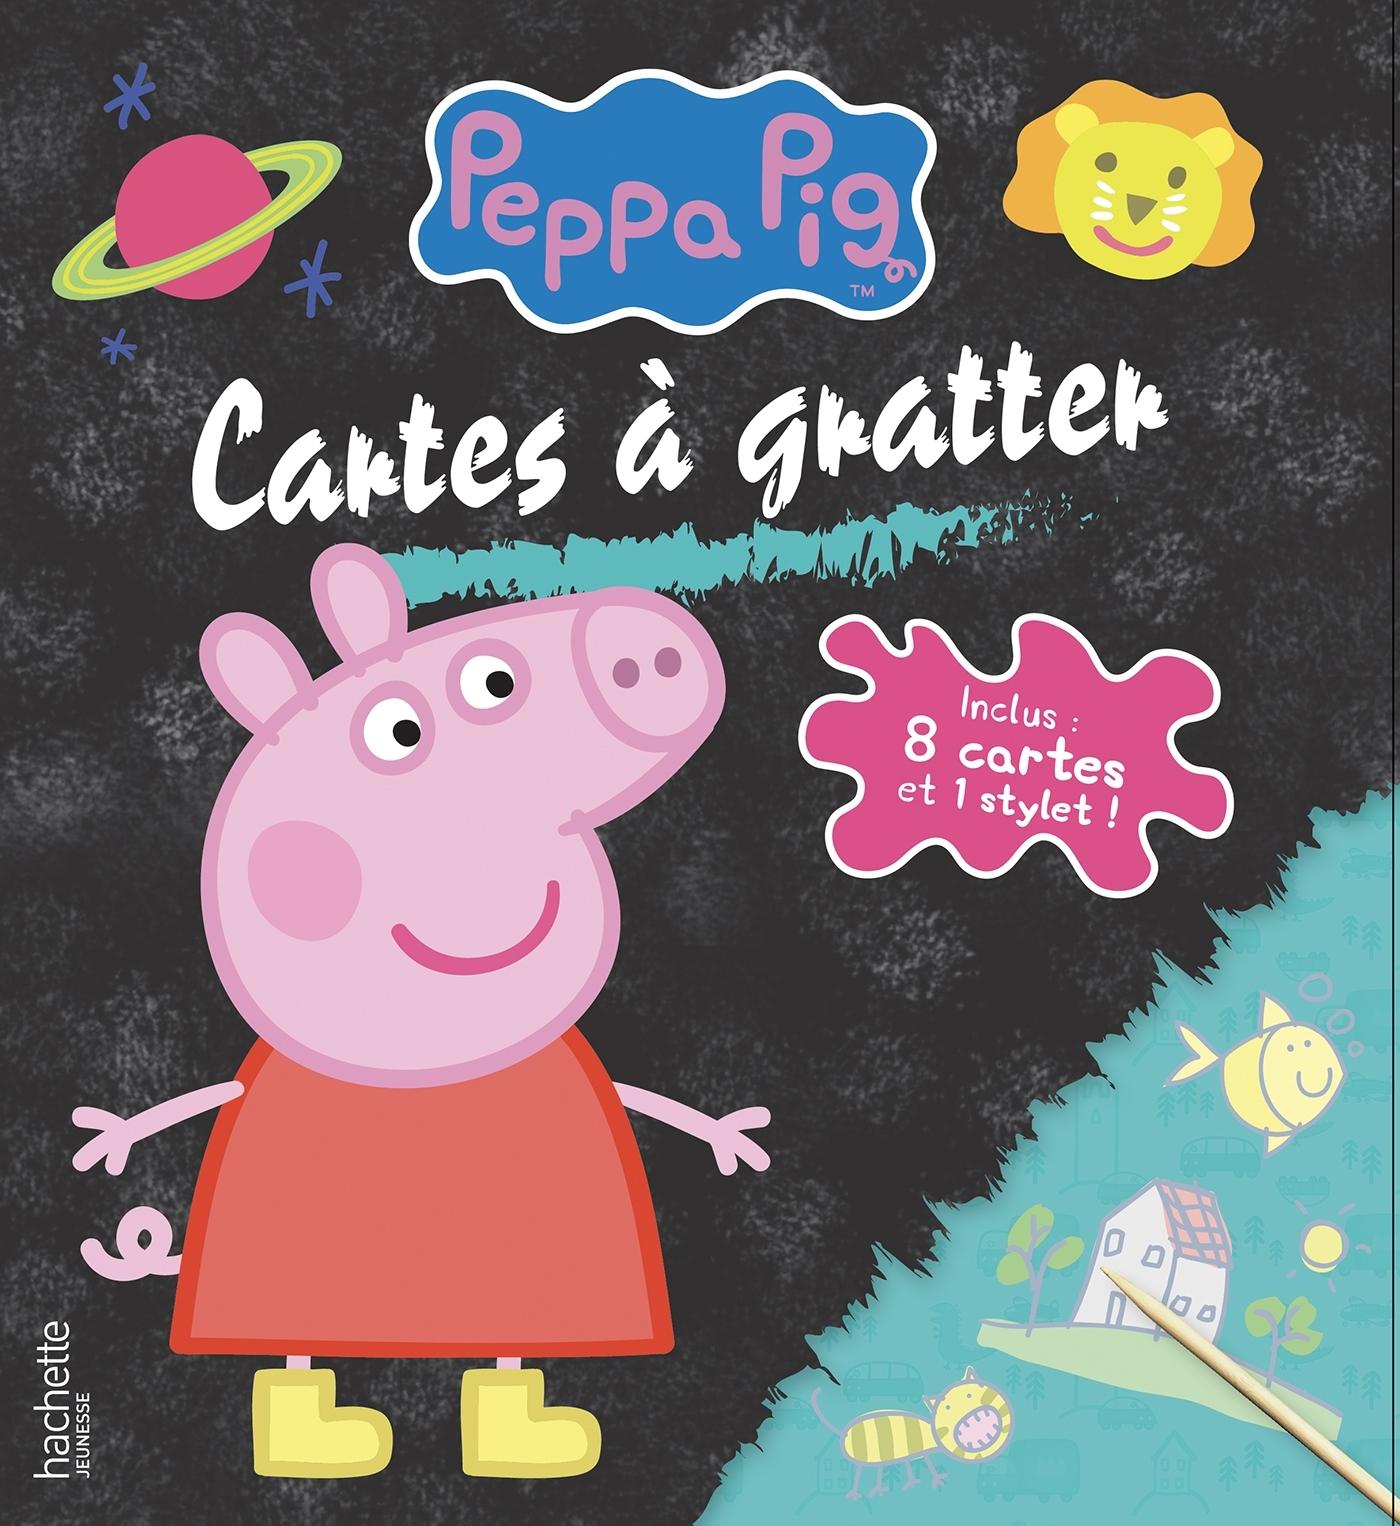 PEPPA PIG - CARTES A GRATTER